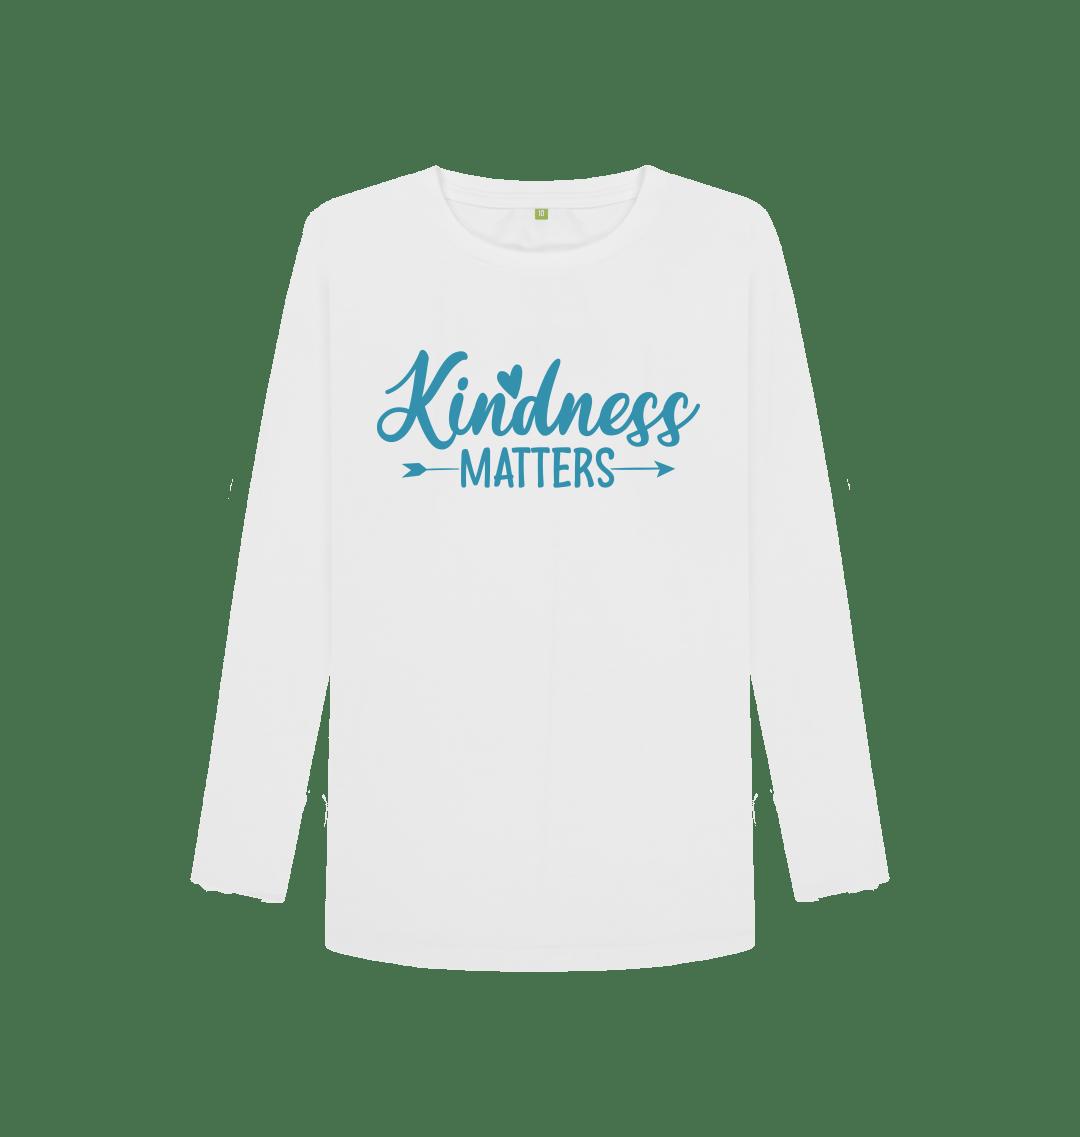 Kindness Matters Women's Long Sleeve Top White